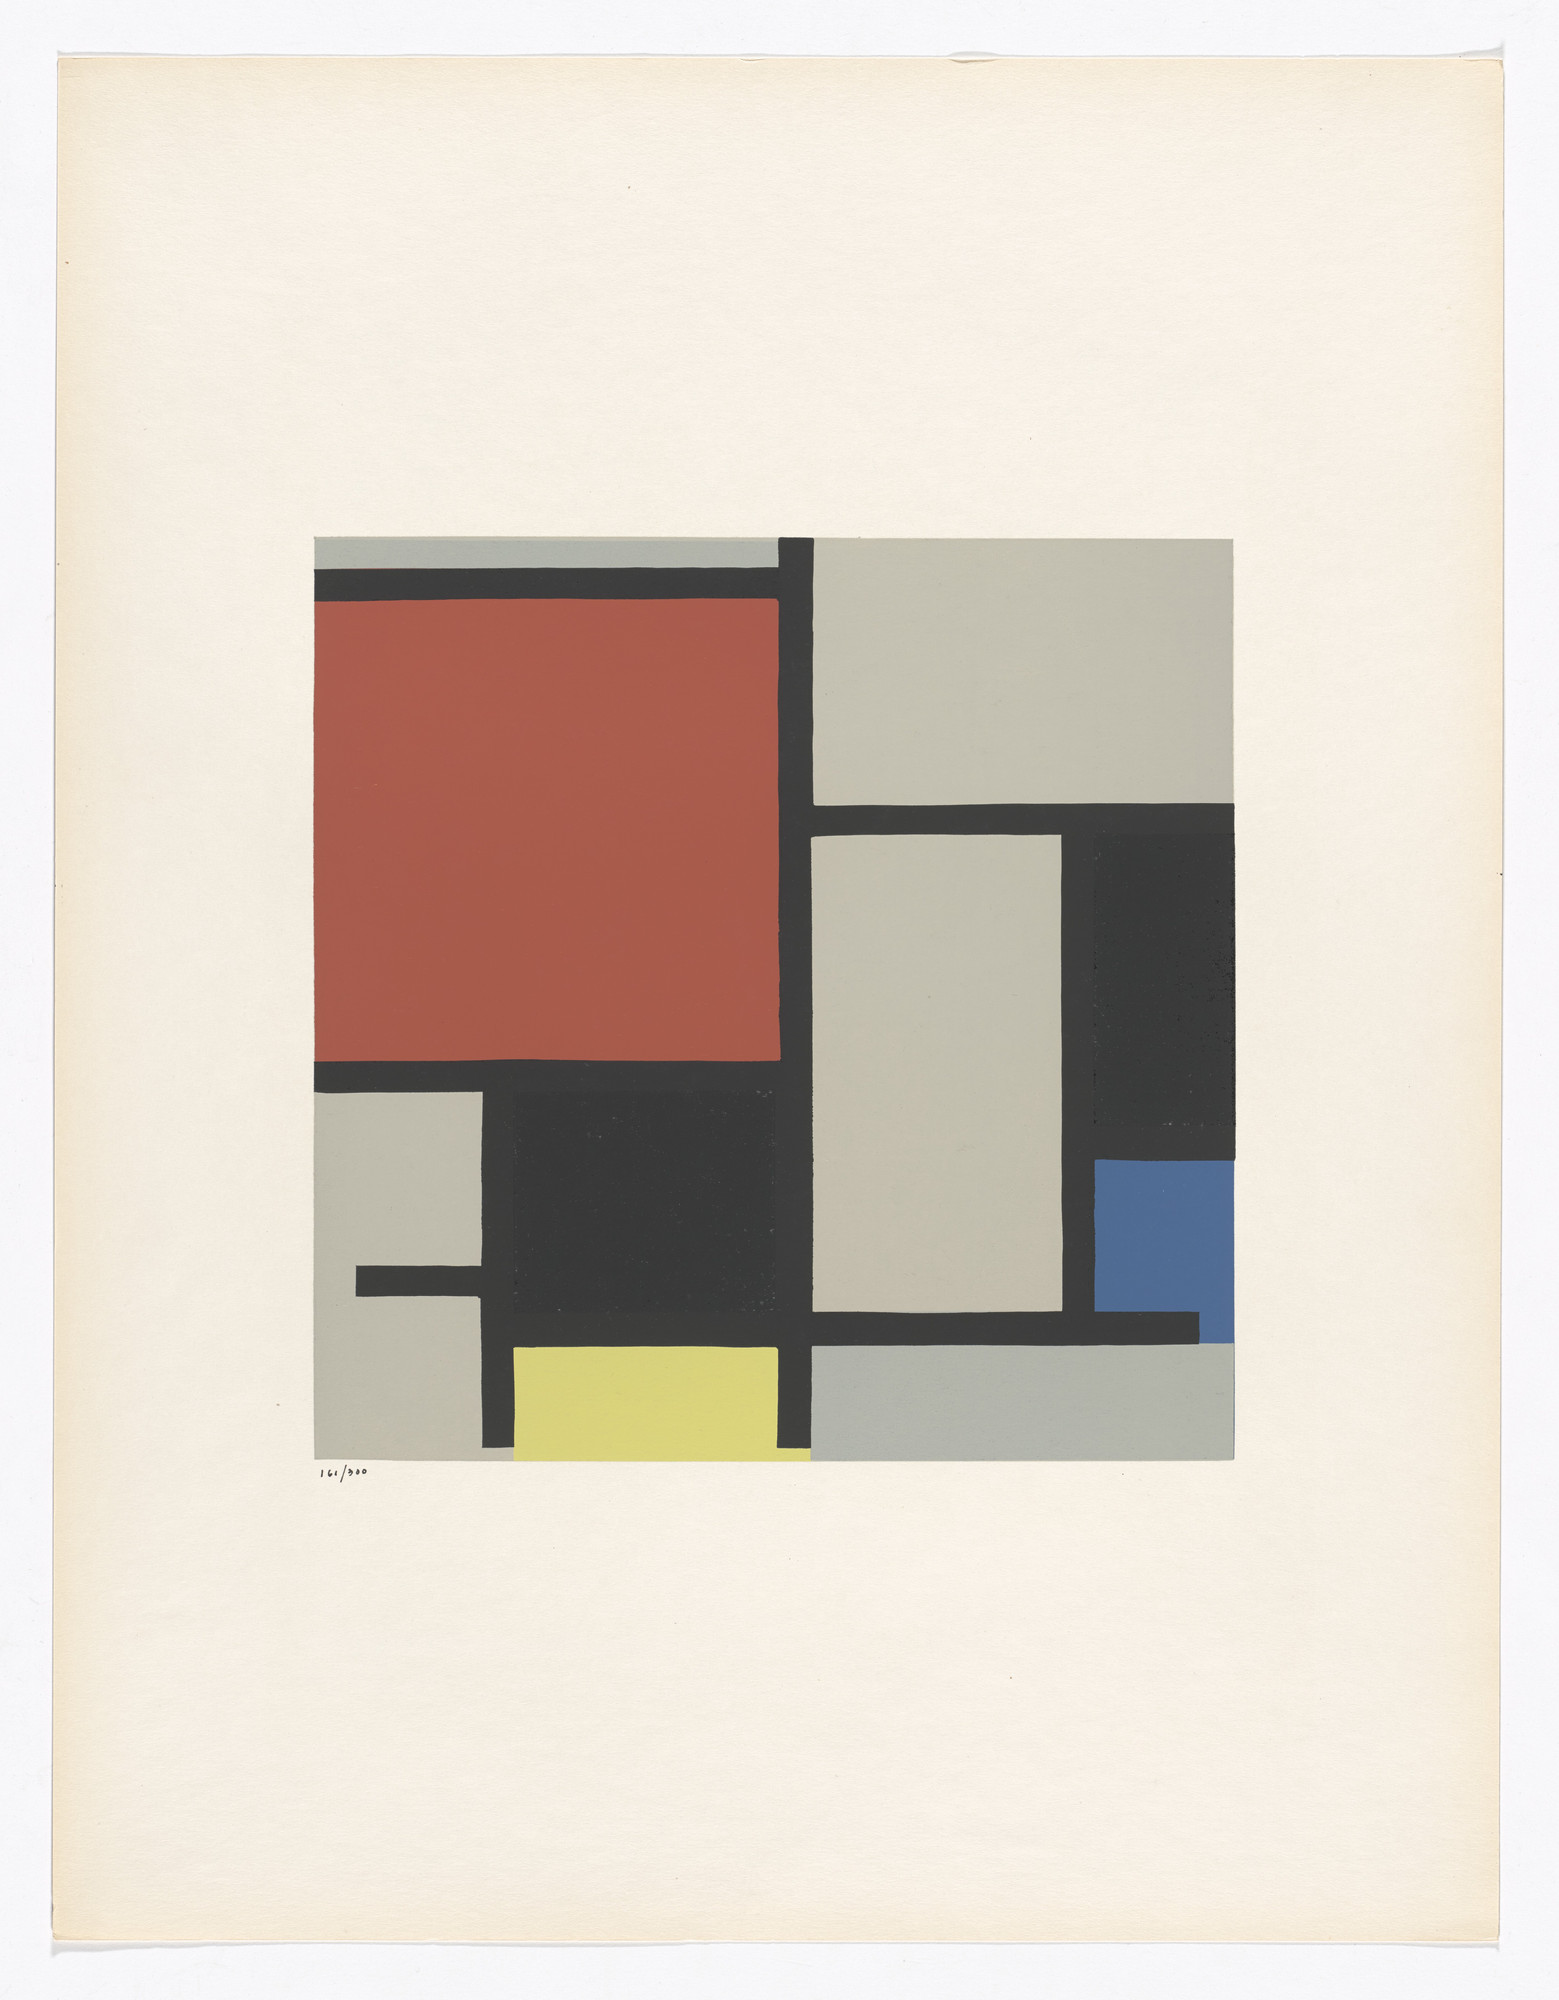 Piet Mondrian Moma